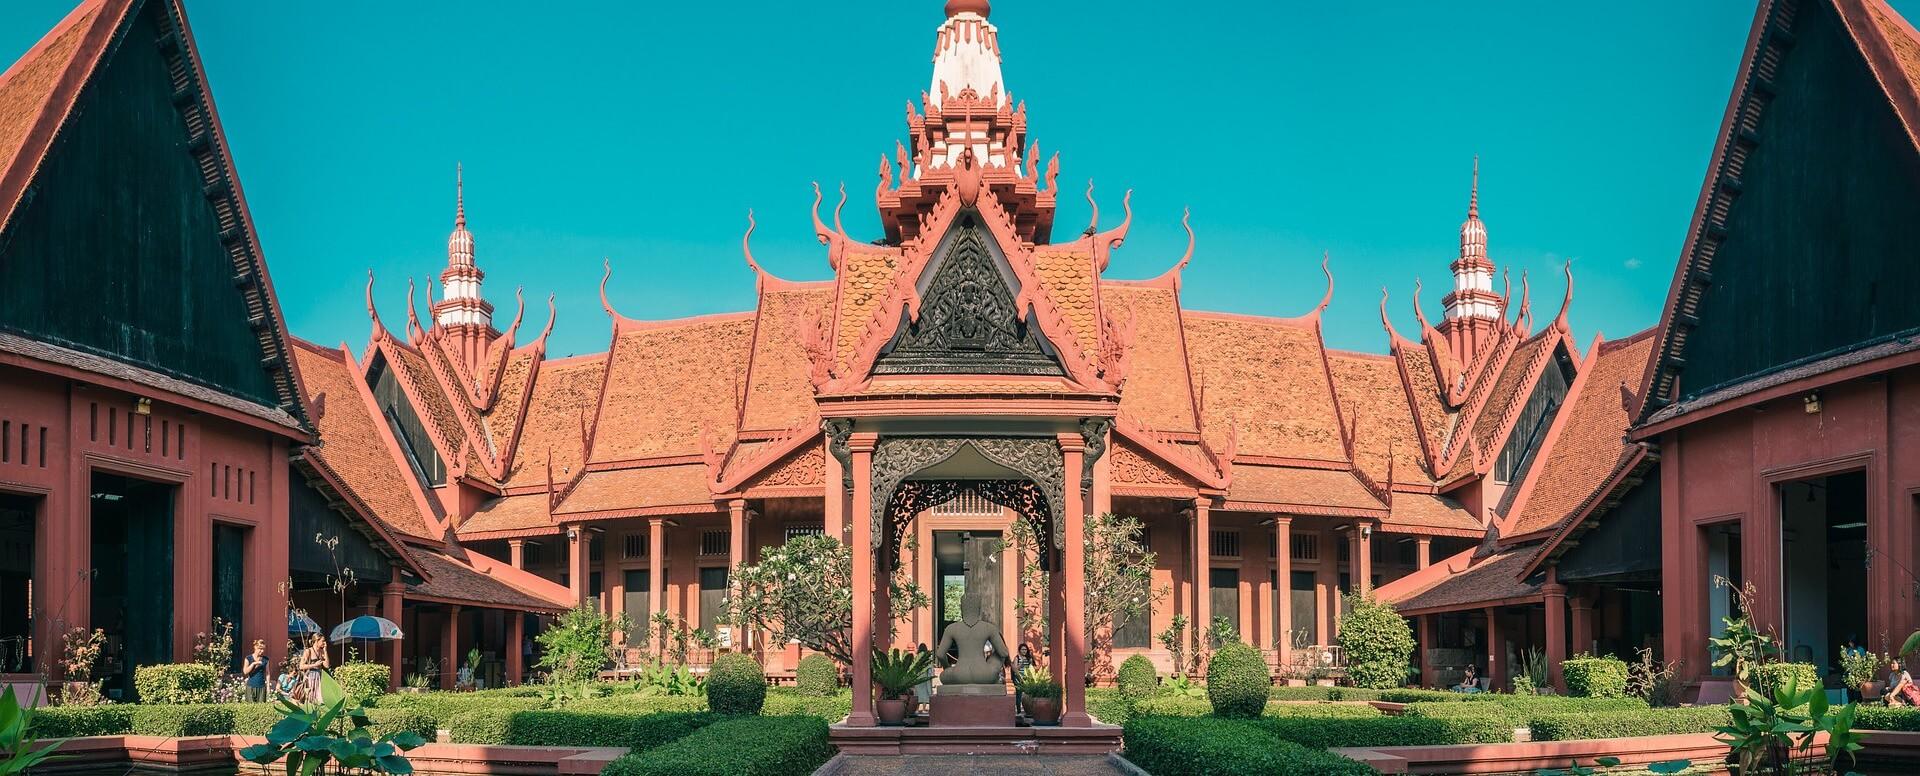 Visiting monuments - Cambodia